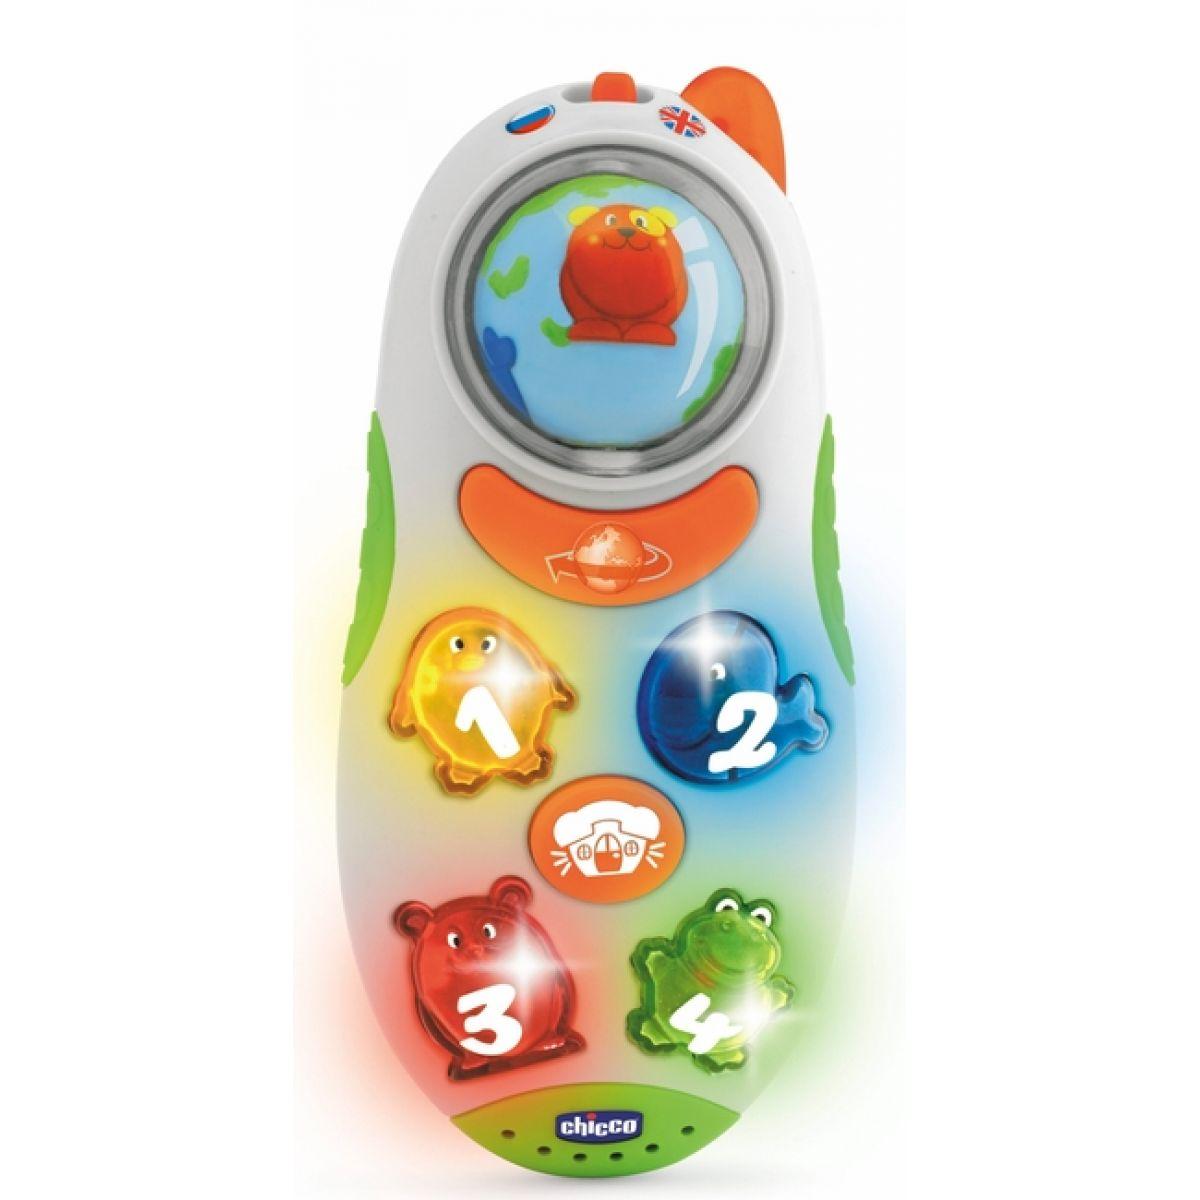 Chicco Mluvící telefon Čj/Aj